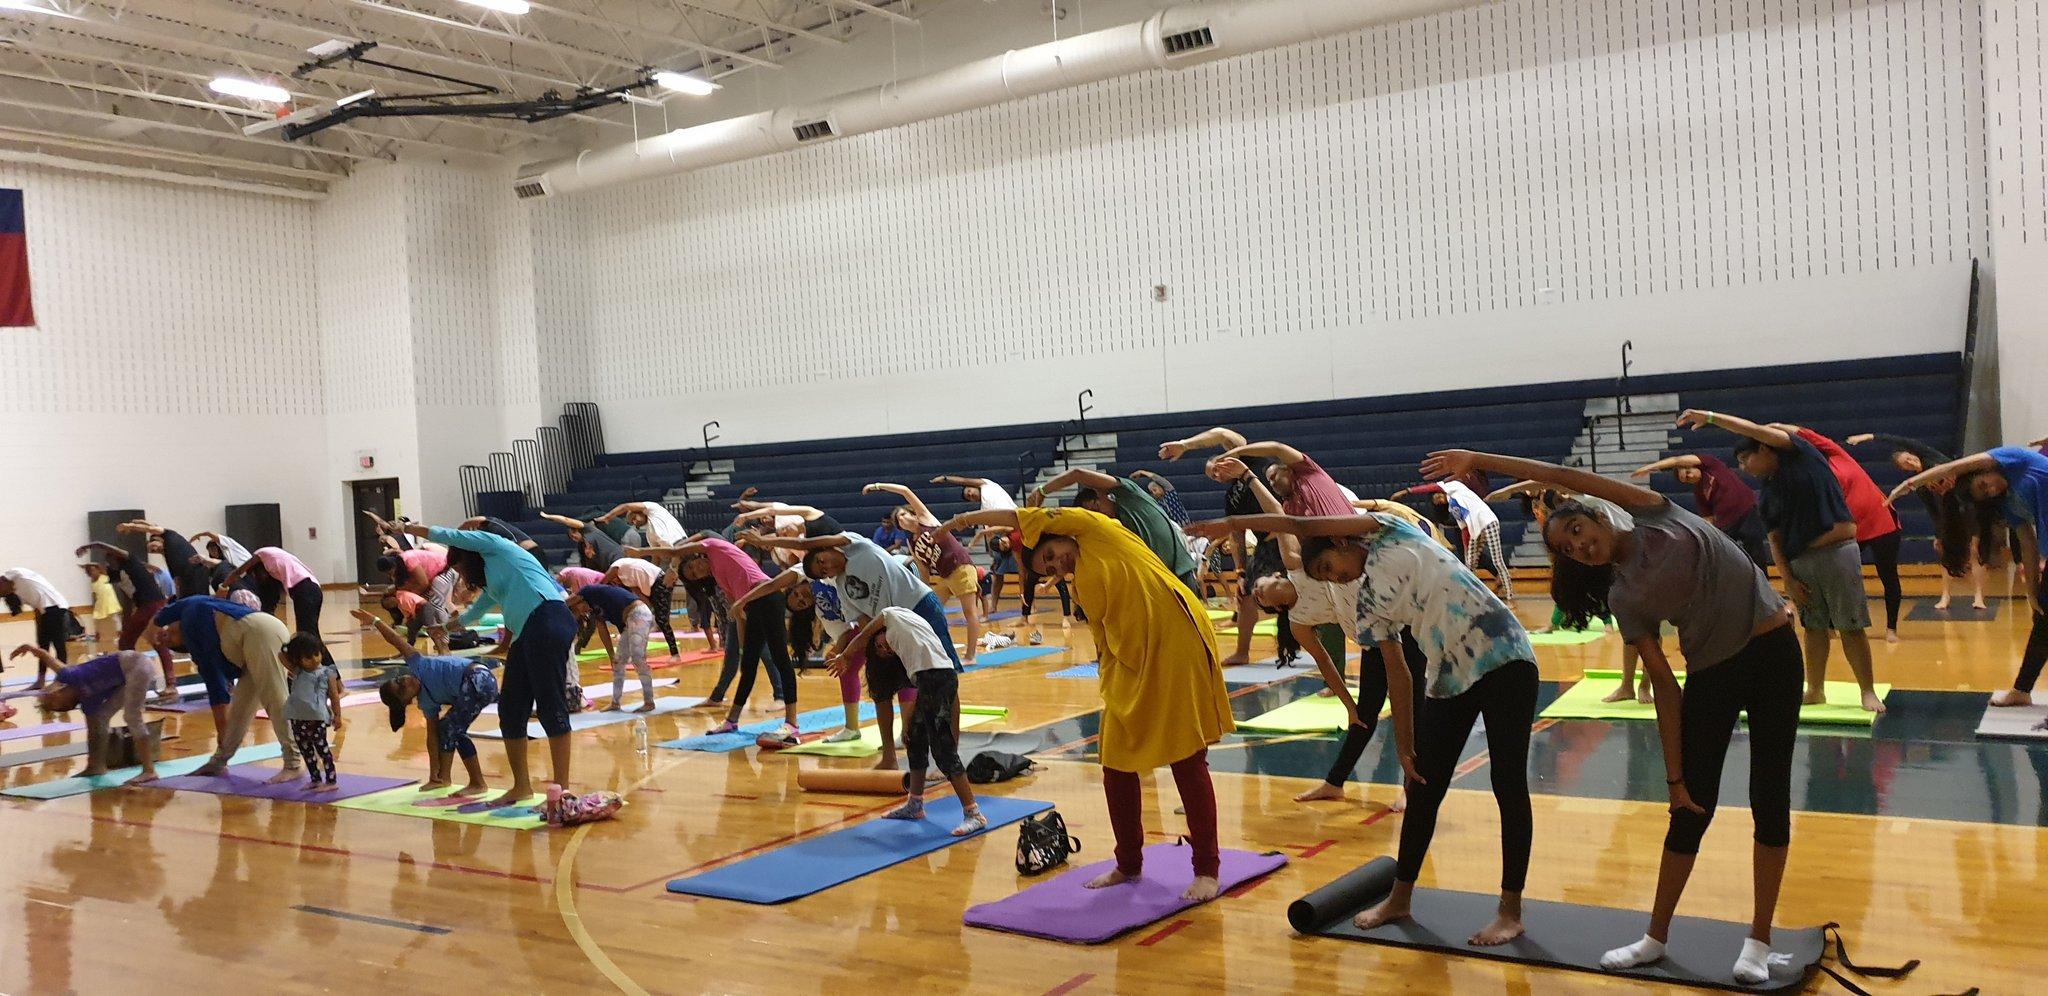 Cgi Houston Cultural Center On Twitter Celebration Of 5th International Day Of Yoga In Dallas With Sw Mukundananda Sanyamalhotra07 At Dallasyogafest Pmoindia Narendramodi Drsjaishankar Harshvshringla Meaindia Iccr Delhi Indianembassyus